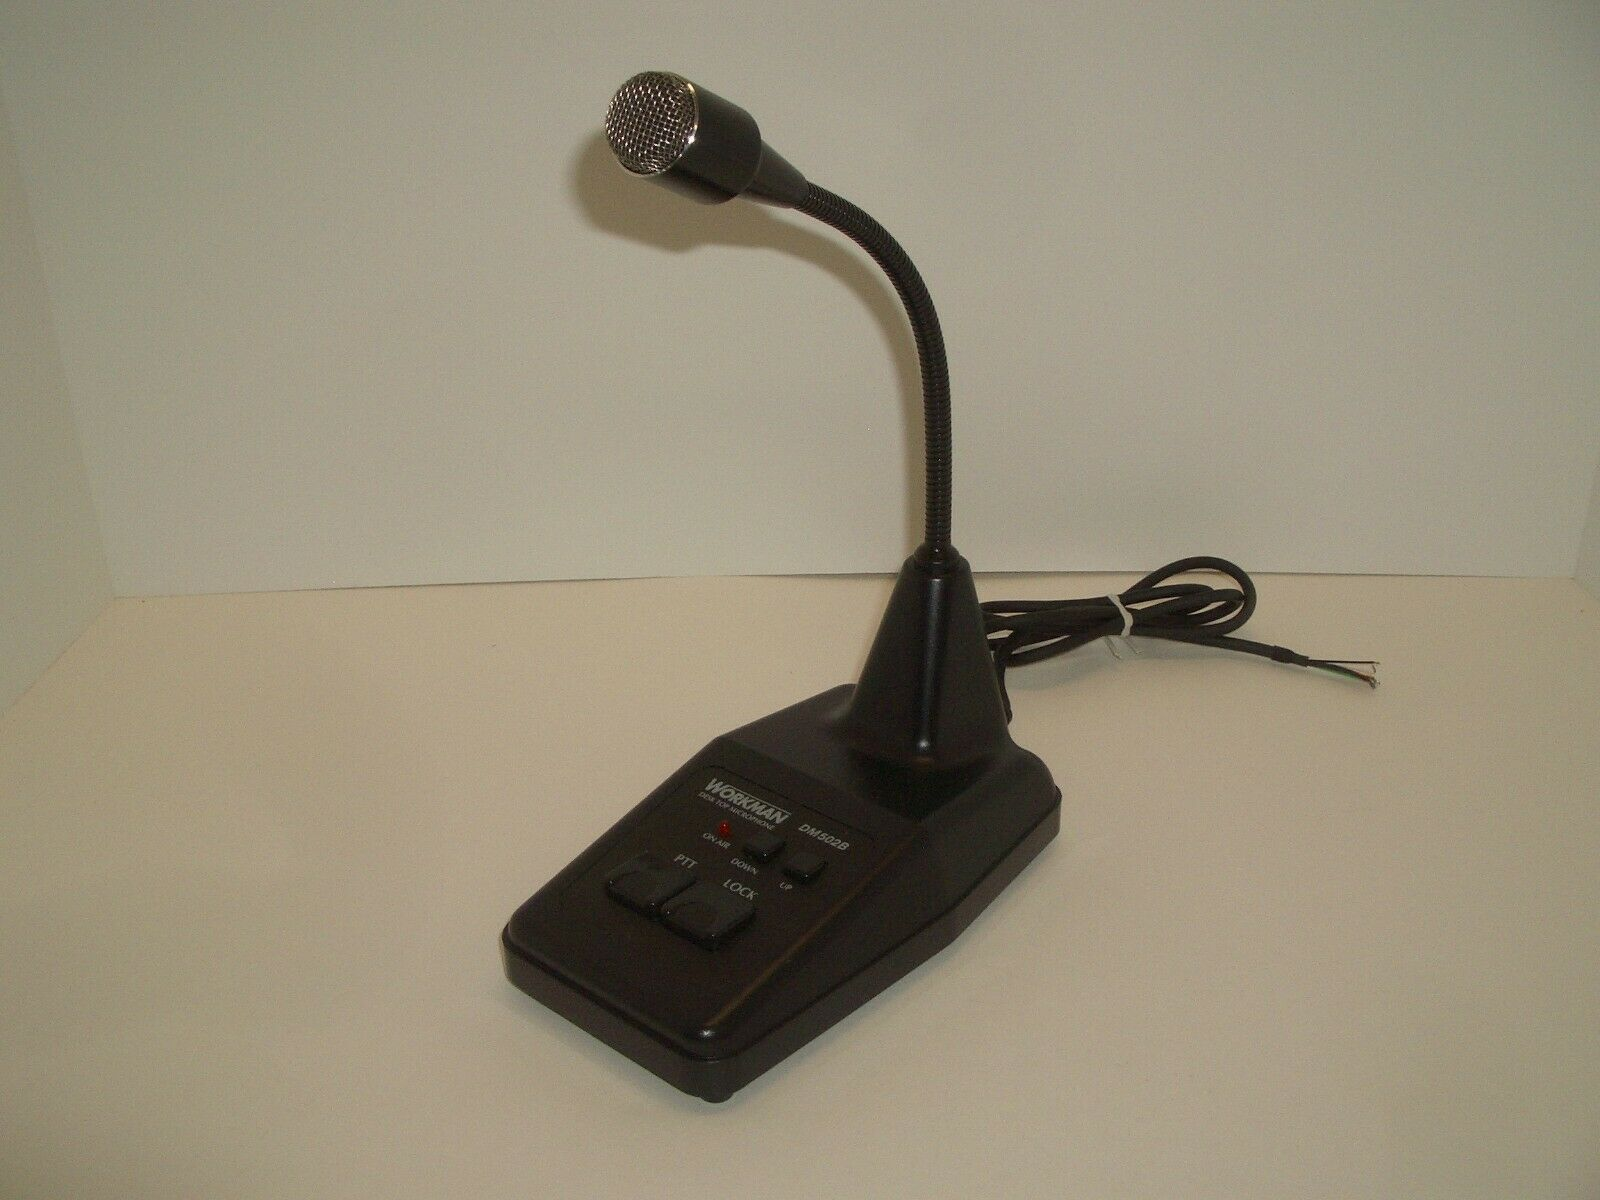 WORKMAN DM502B LAANTEK DTM502 CB HAM POWER AMPLIFIED DESK DESKTOP MICROPHONE. Buy it now for 75.95